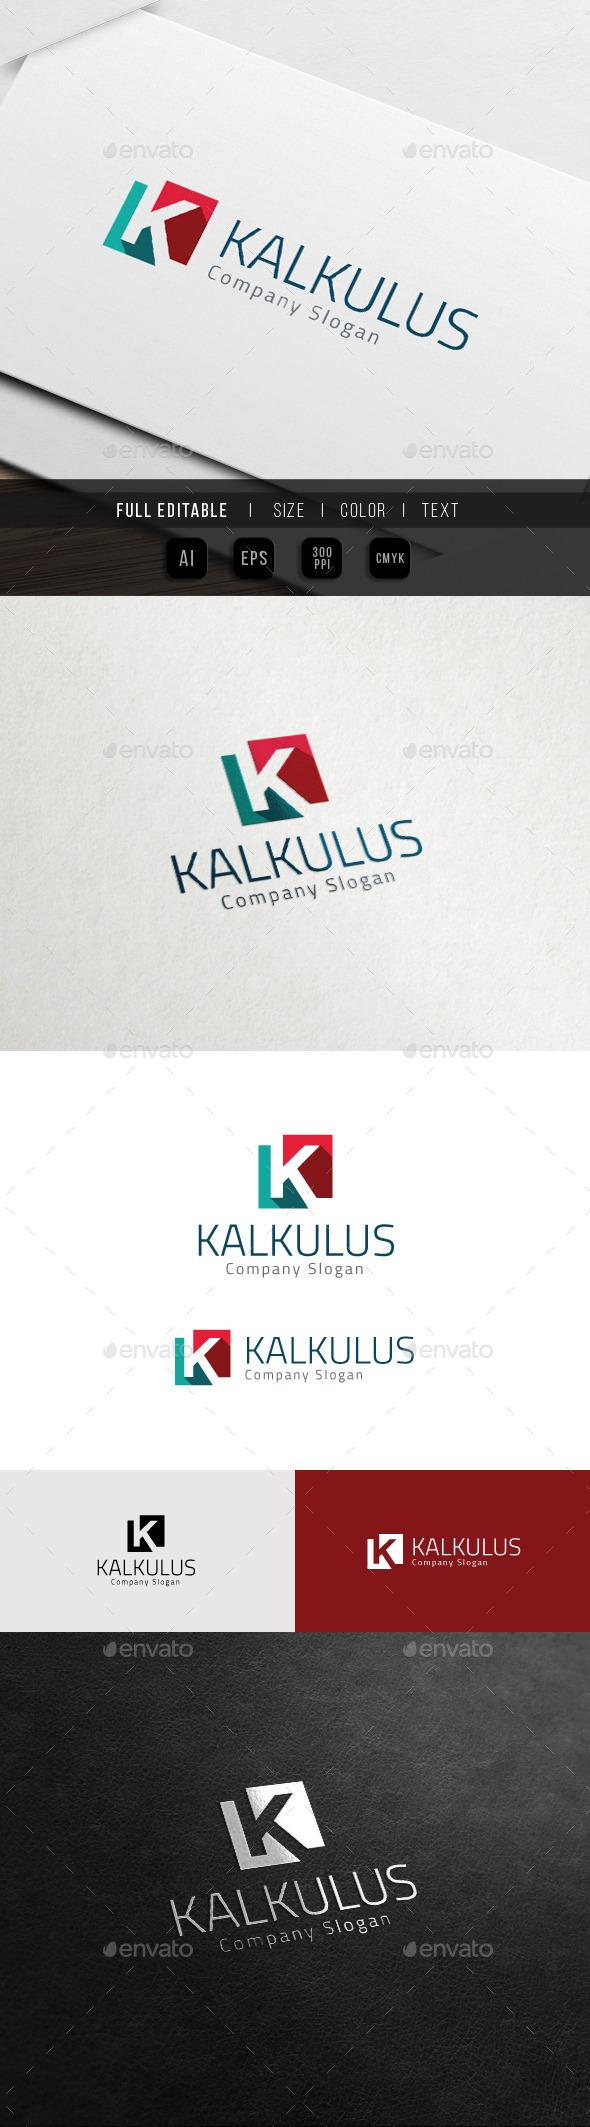 Corporate Brand - Marketing Finance - K Logo